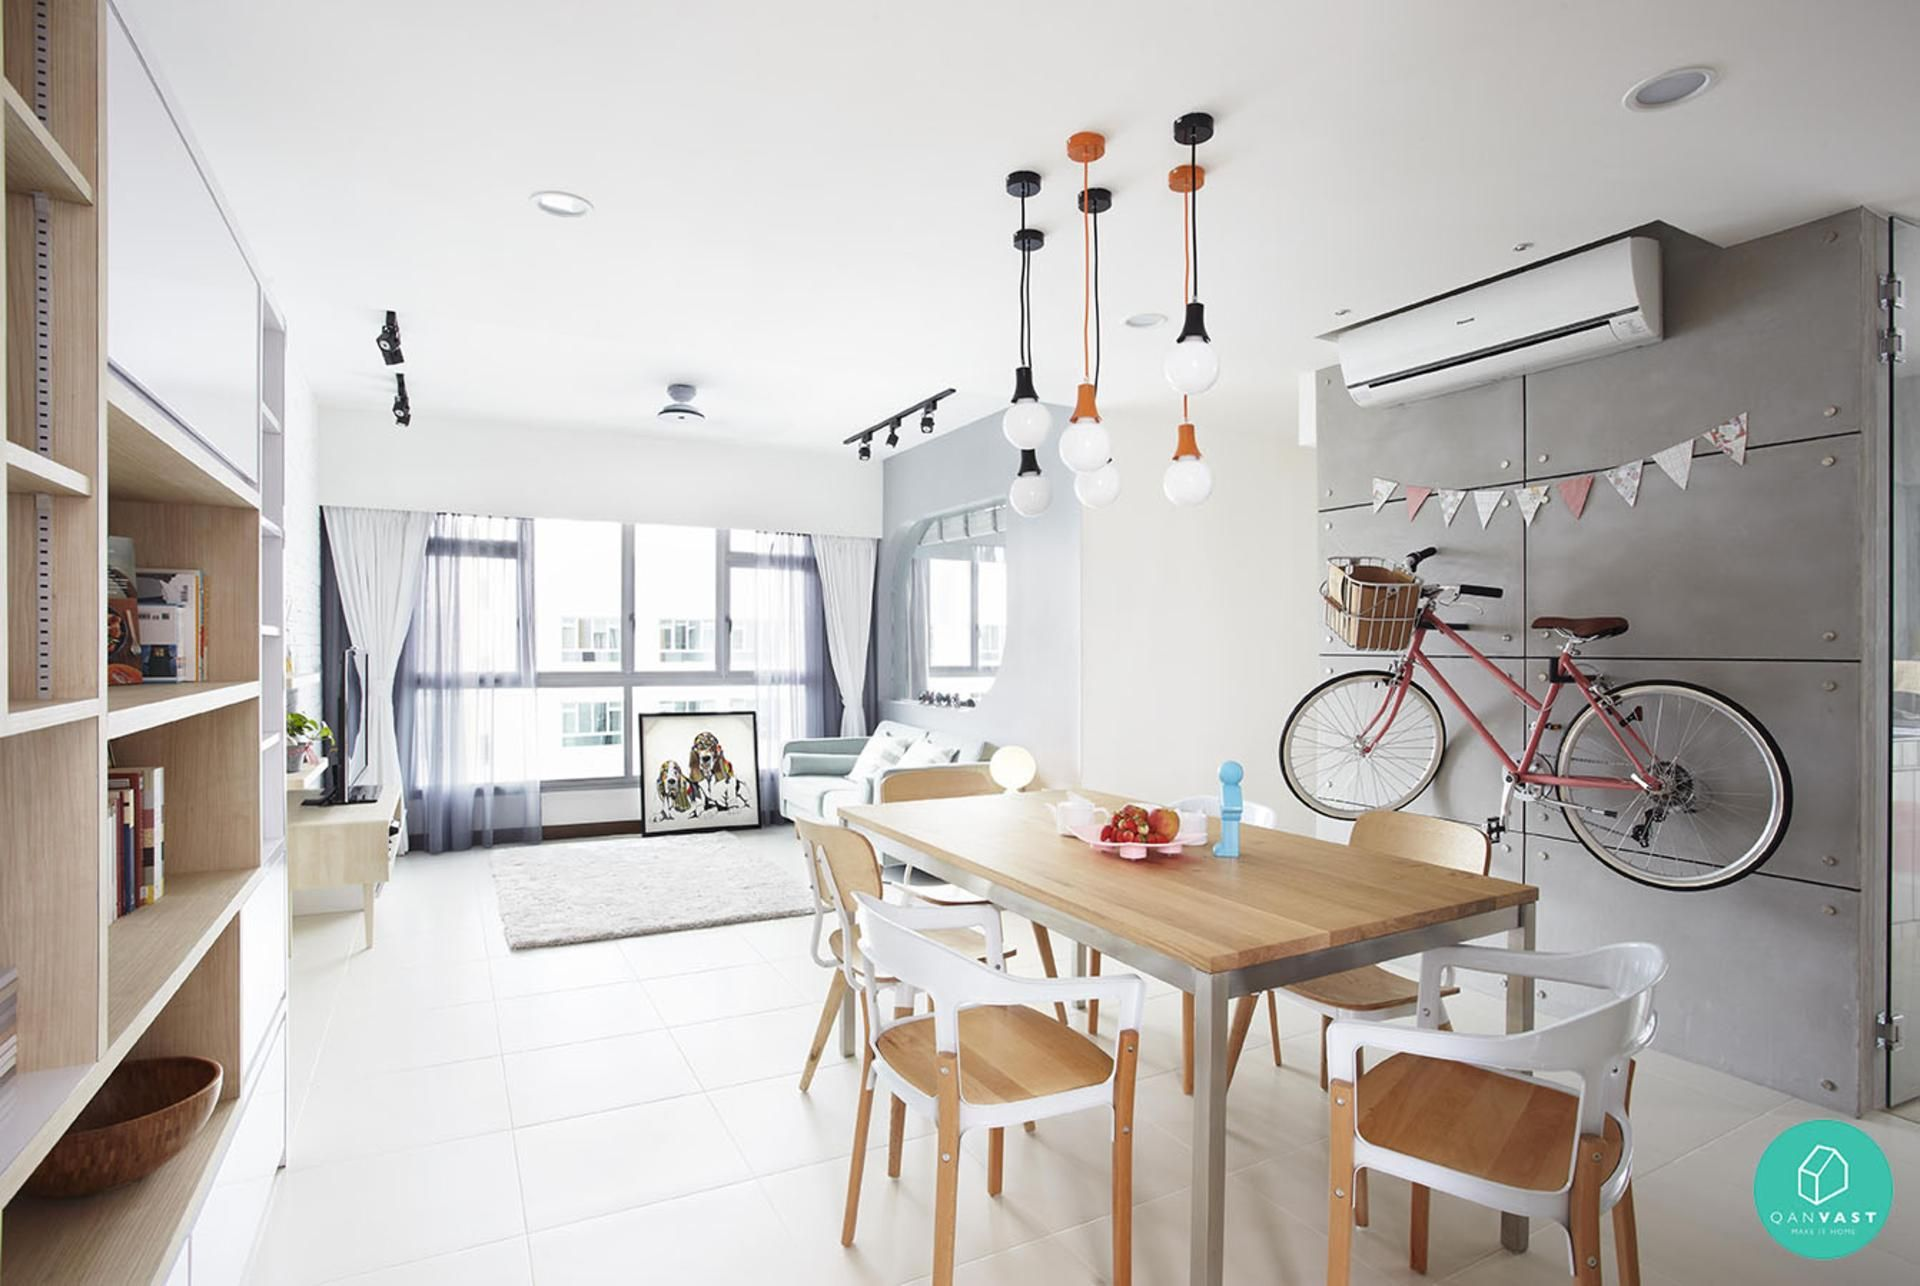 Ideas | Qanvast | Home Design, Renovation, Remodelling & Furnishing ...